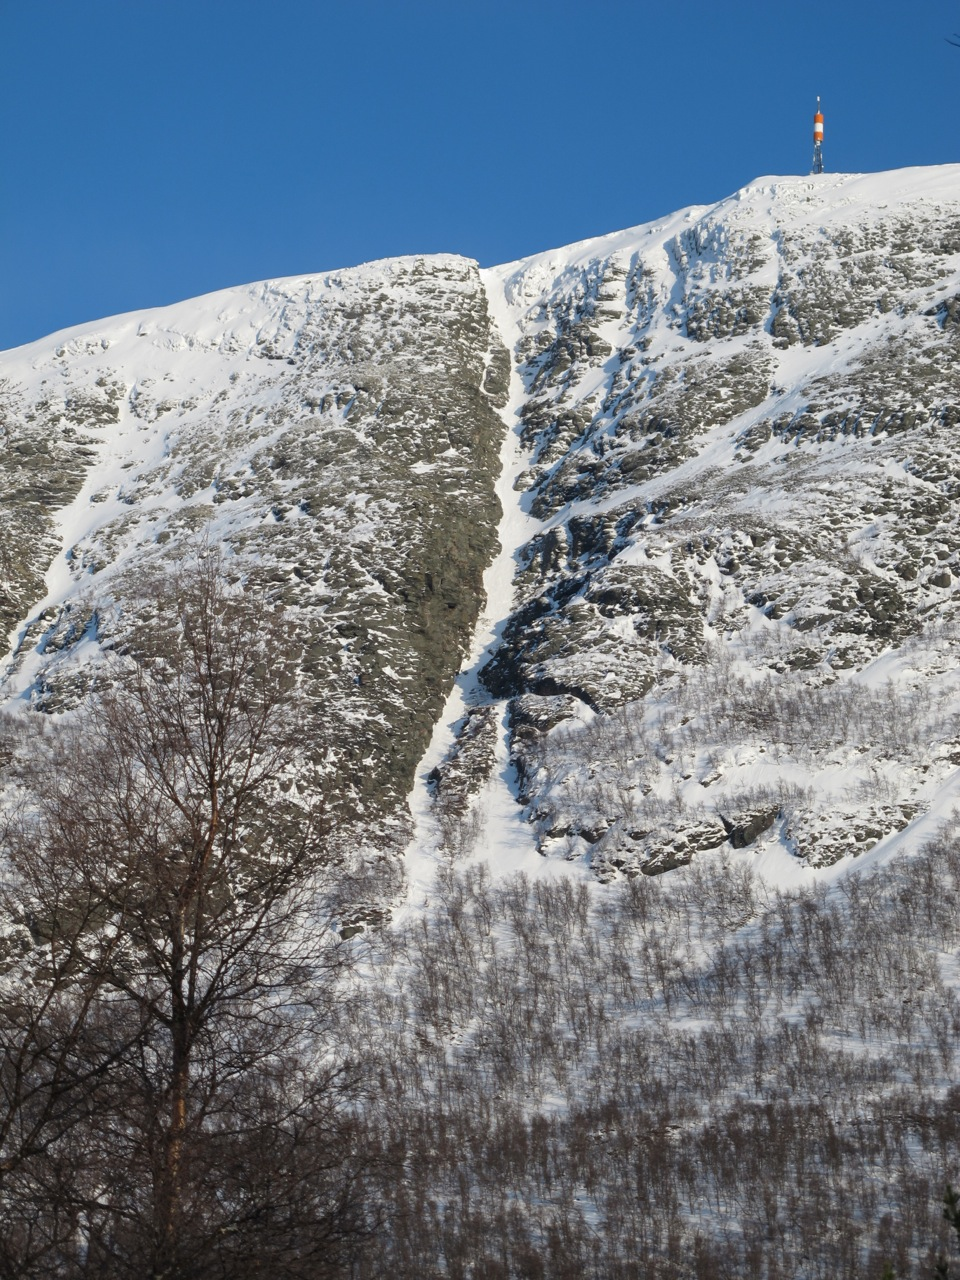 TRANGT OM PLASSEN: Storskæra på Allmannberget gir en real utfordring. Det har flere smertelig fått erfare. Foto: Bård Smestad.